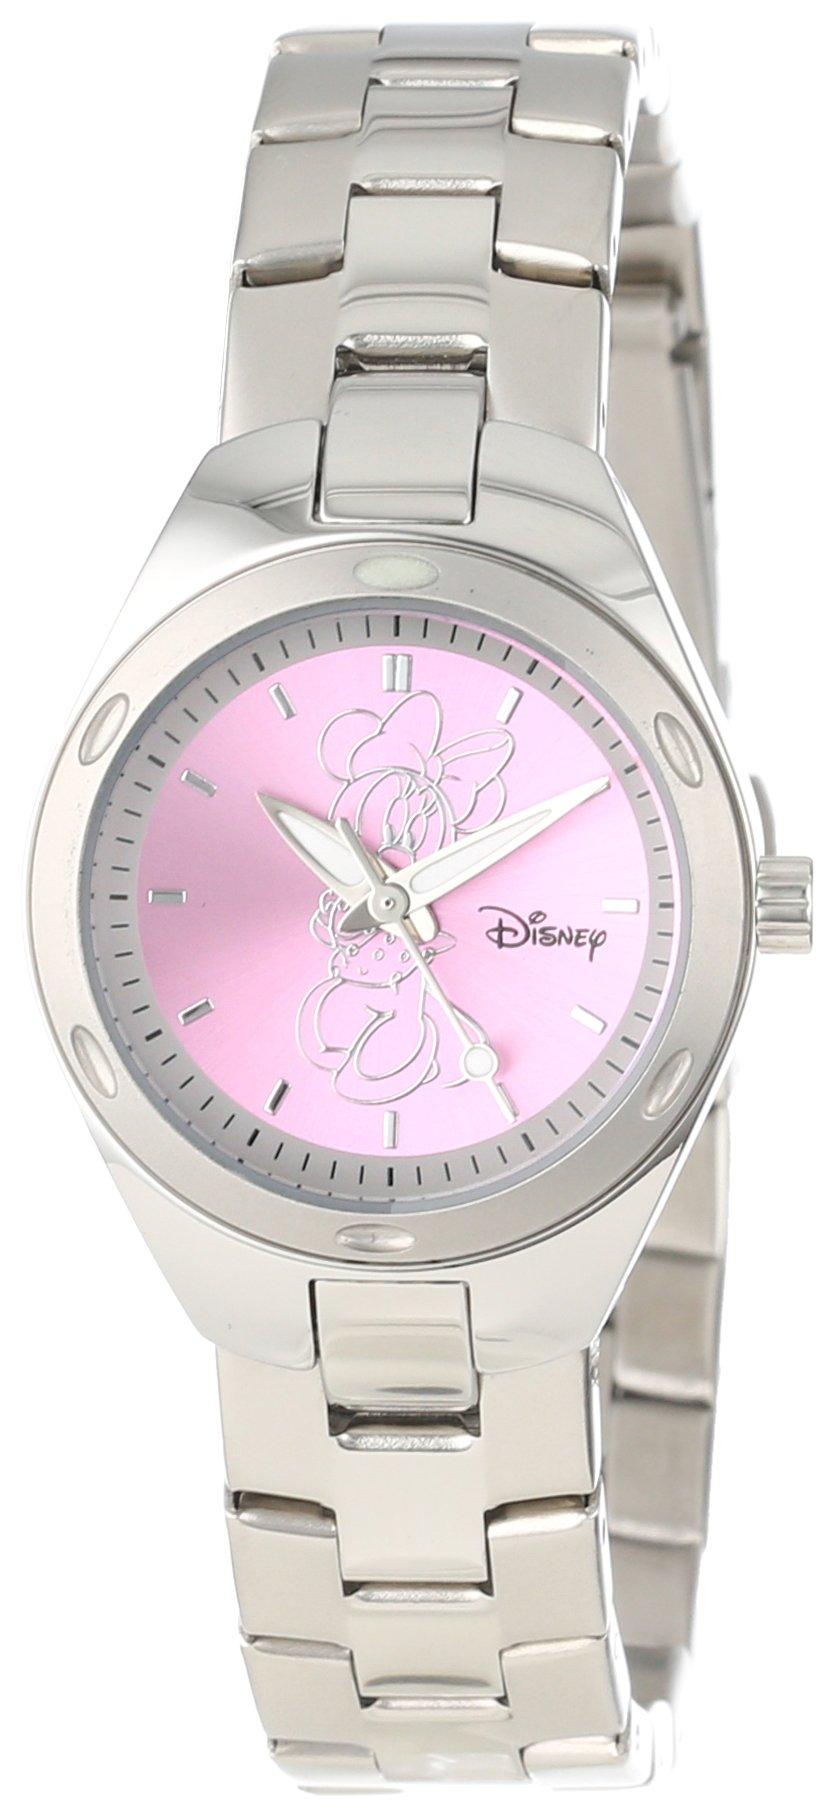 Disney Women's W000488 Minnie Mouse Stainless Steel Bracelet Watch